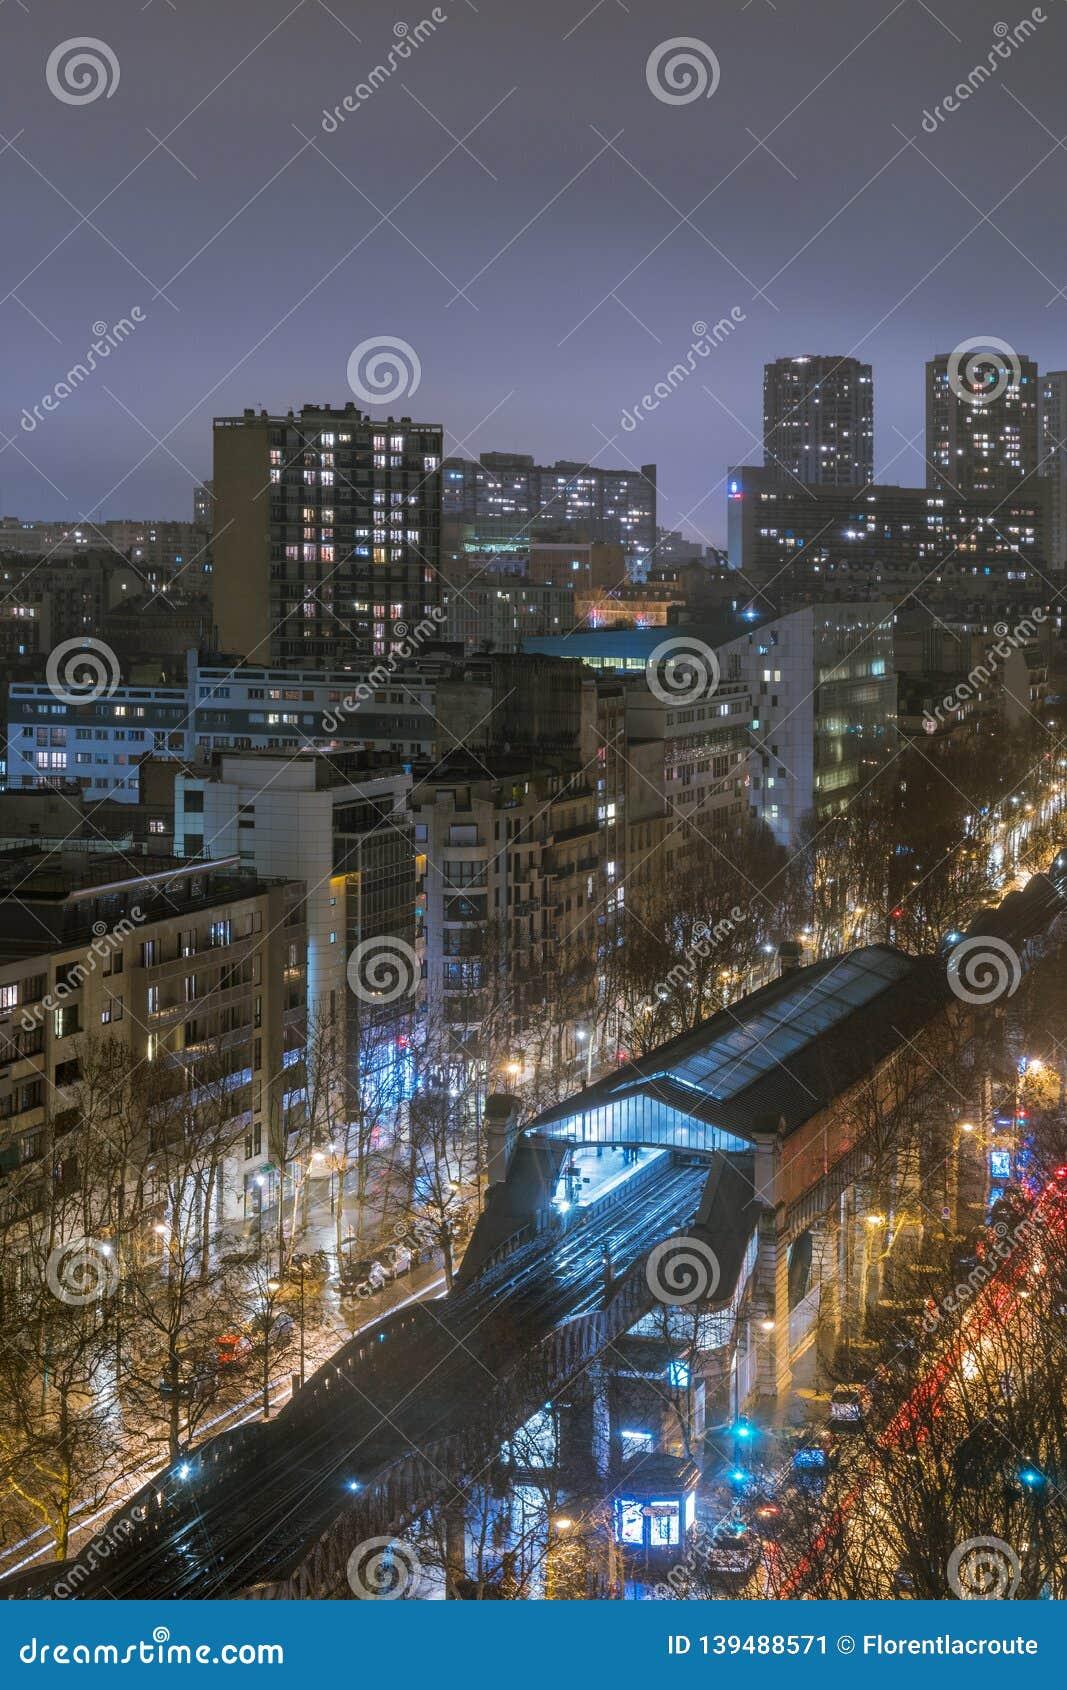 Subway station on a bridge at night in Paris, France